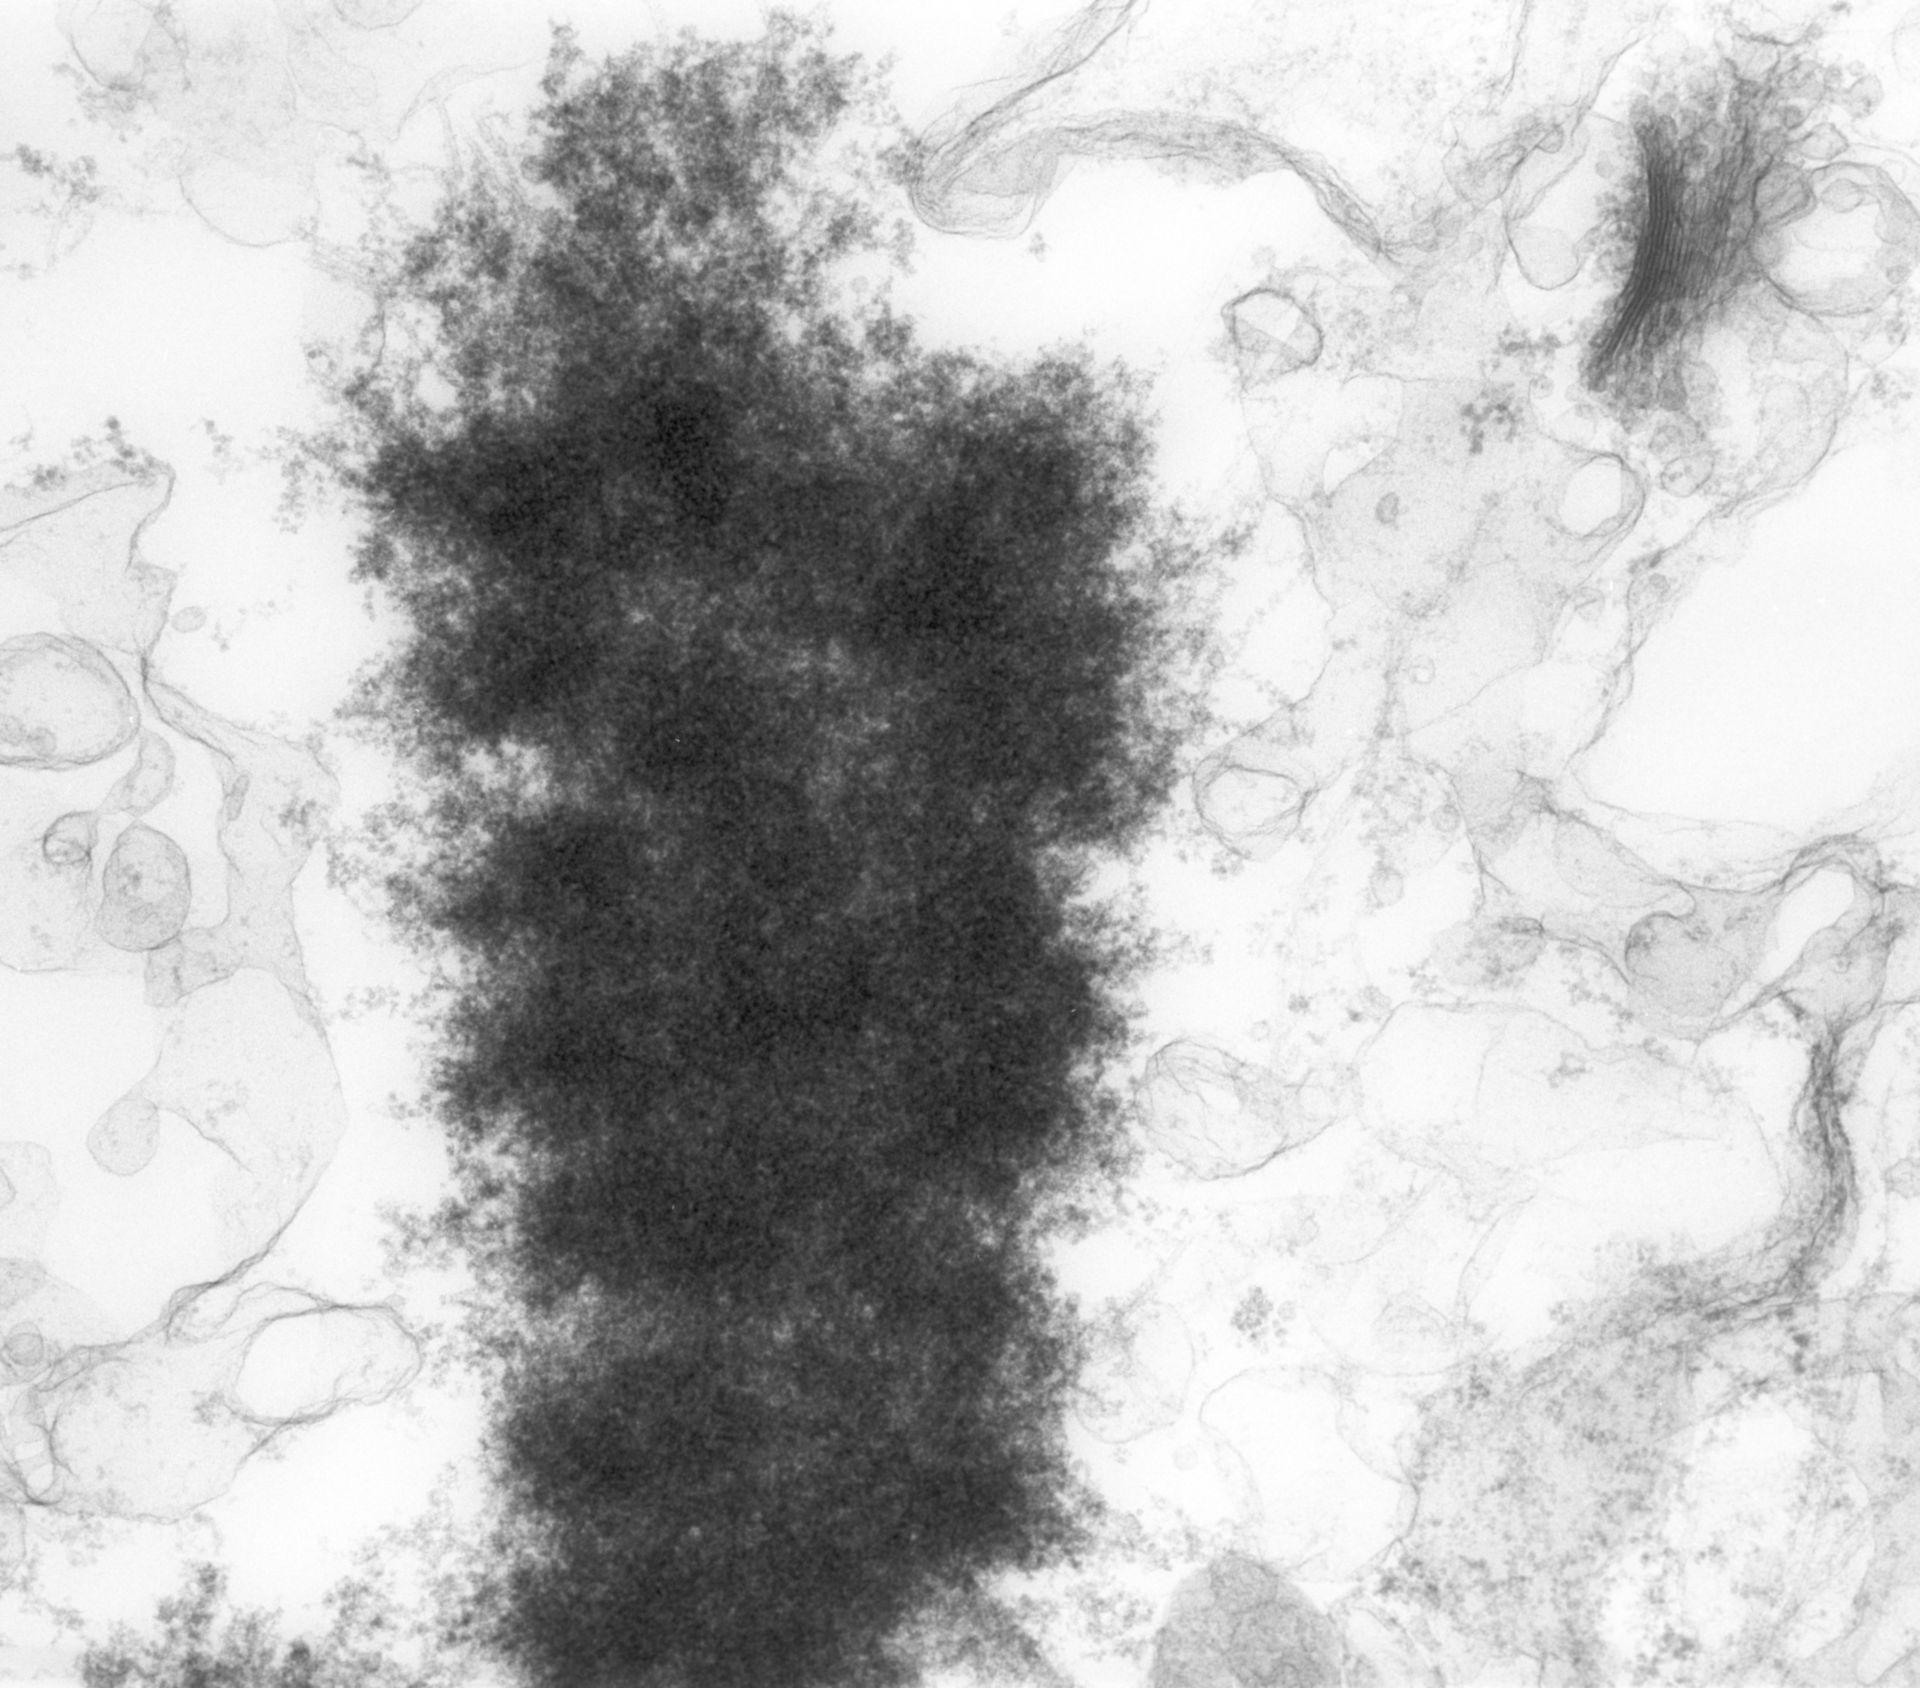 Haemanthus katharinae (Nuclear chromosome) - CIL:11904